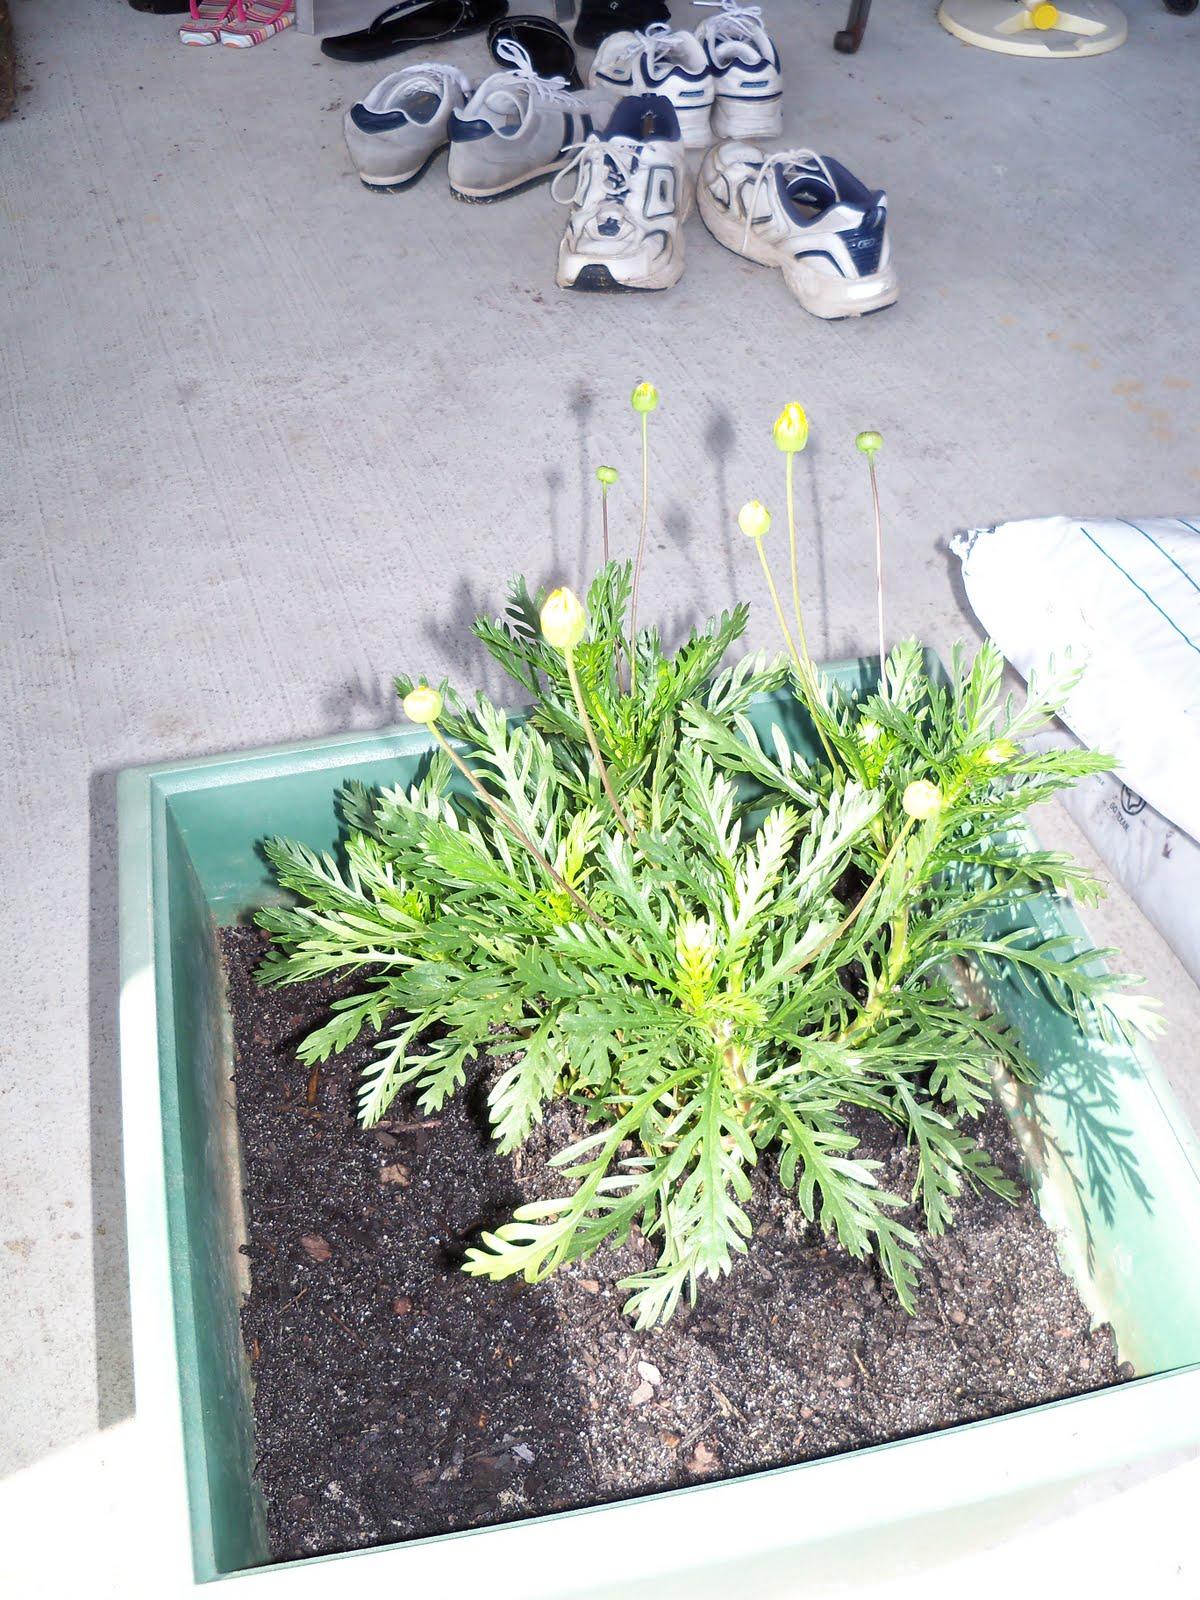 Gardening 2010 - 101_0248.JPG